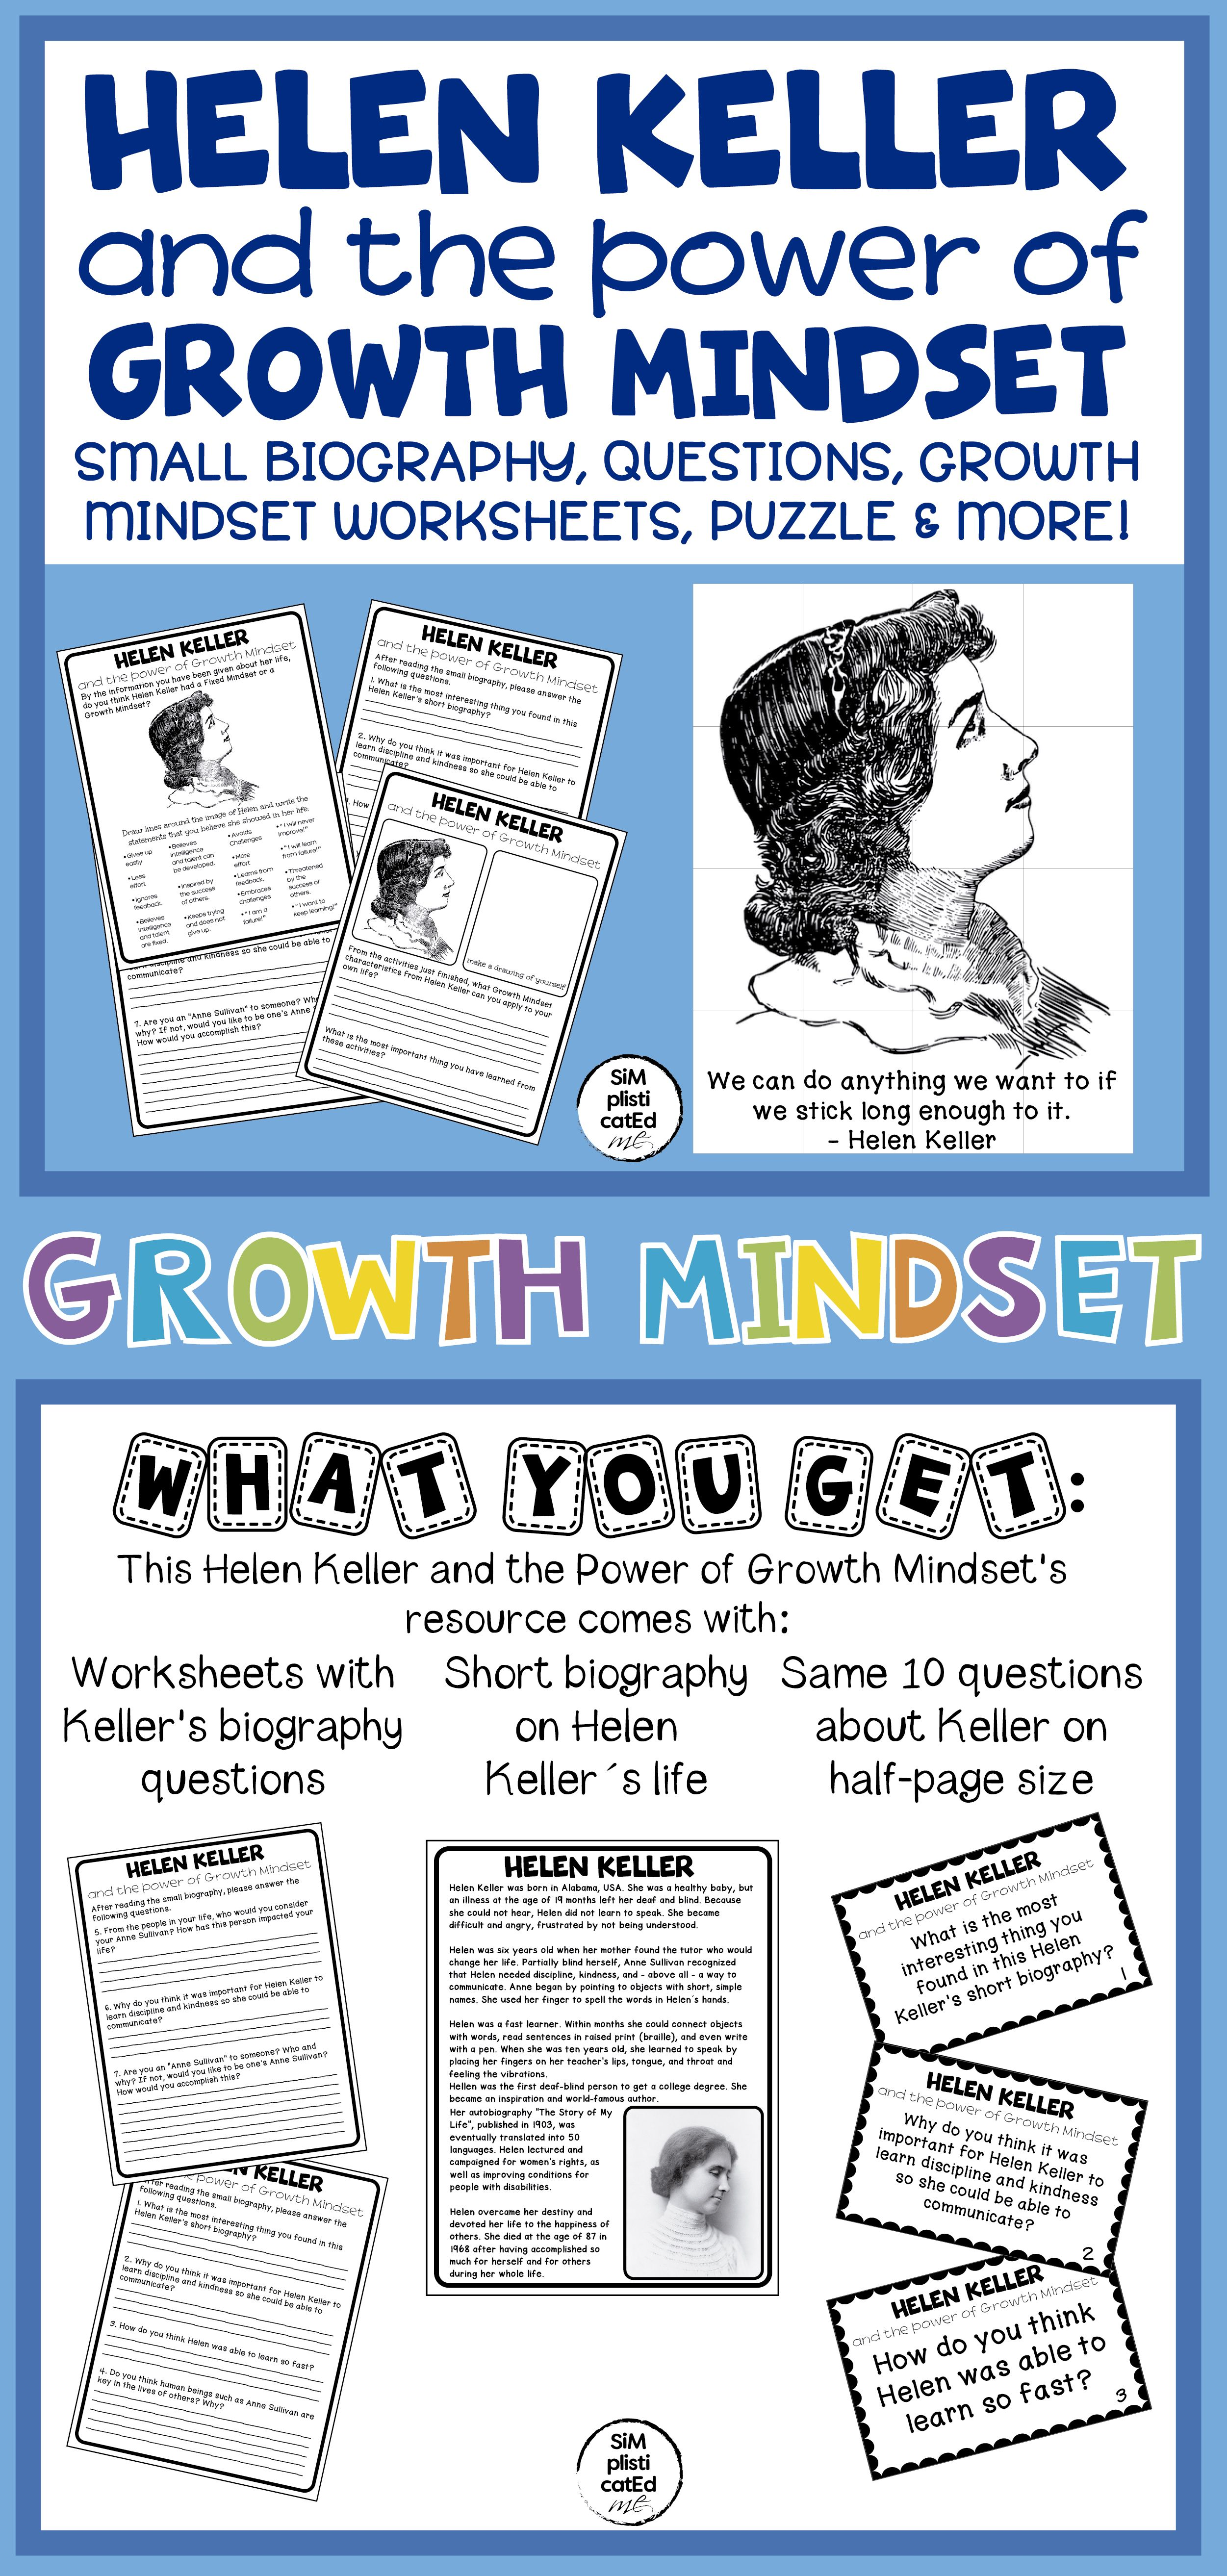 Worksheets Helen Keller Elementary   Printable Worksheets and Activities  for Teachers [ 5253 x 2502 Pixel ]